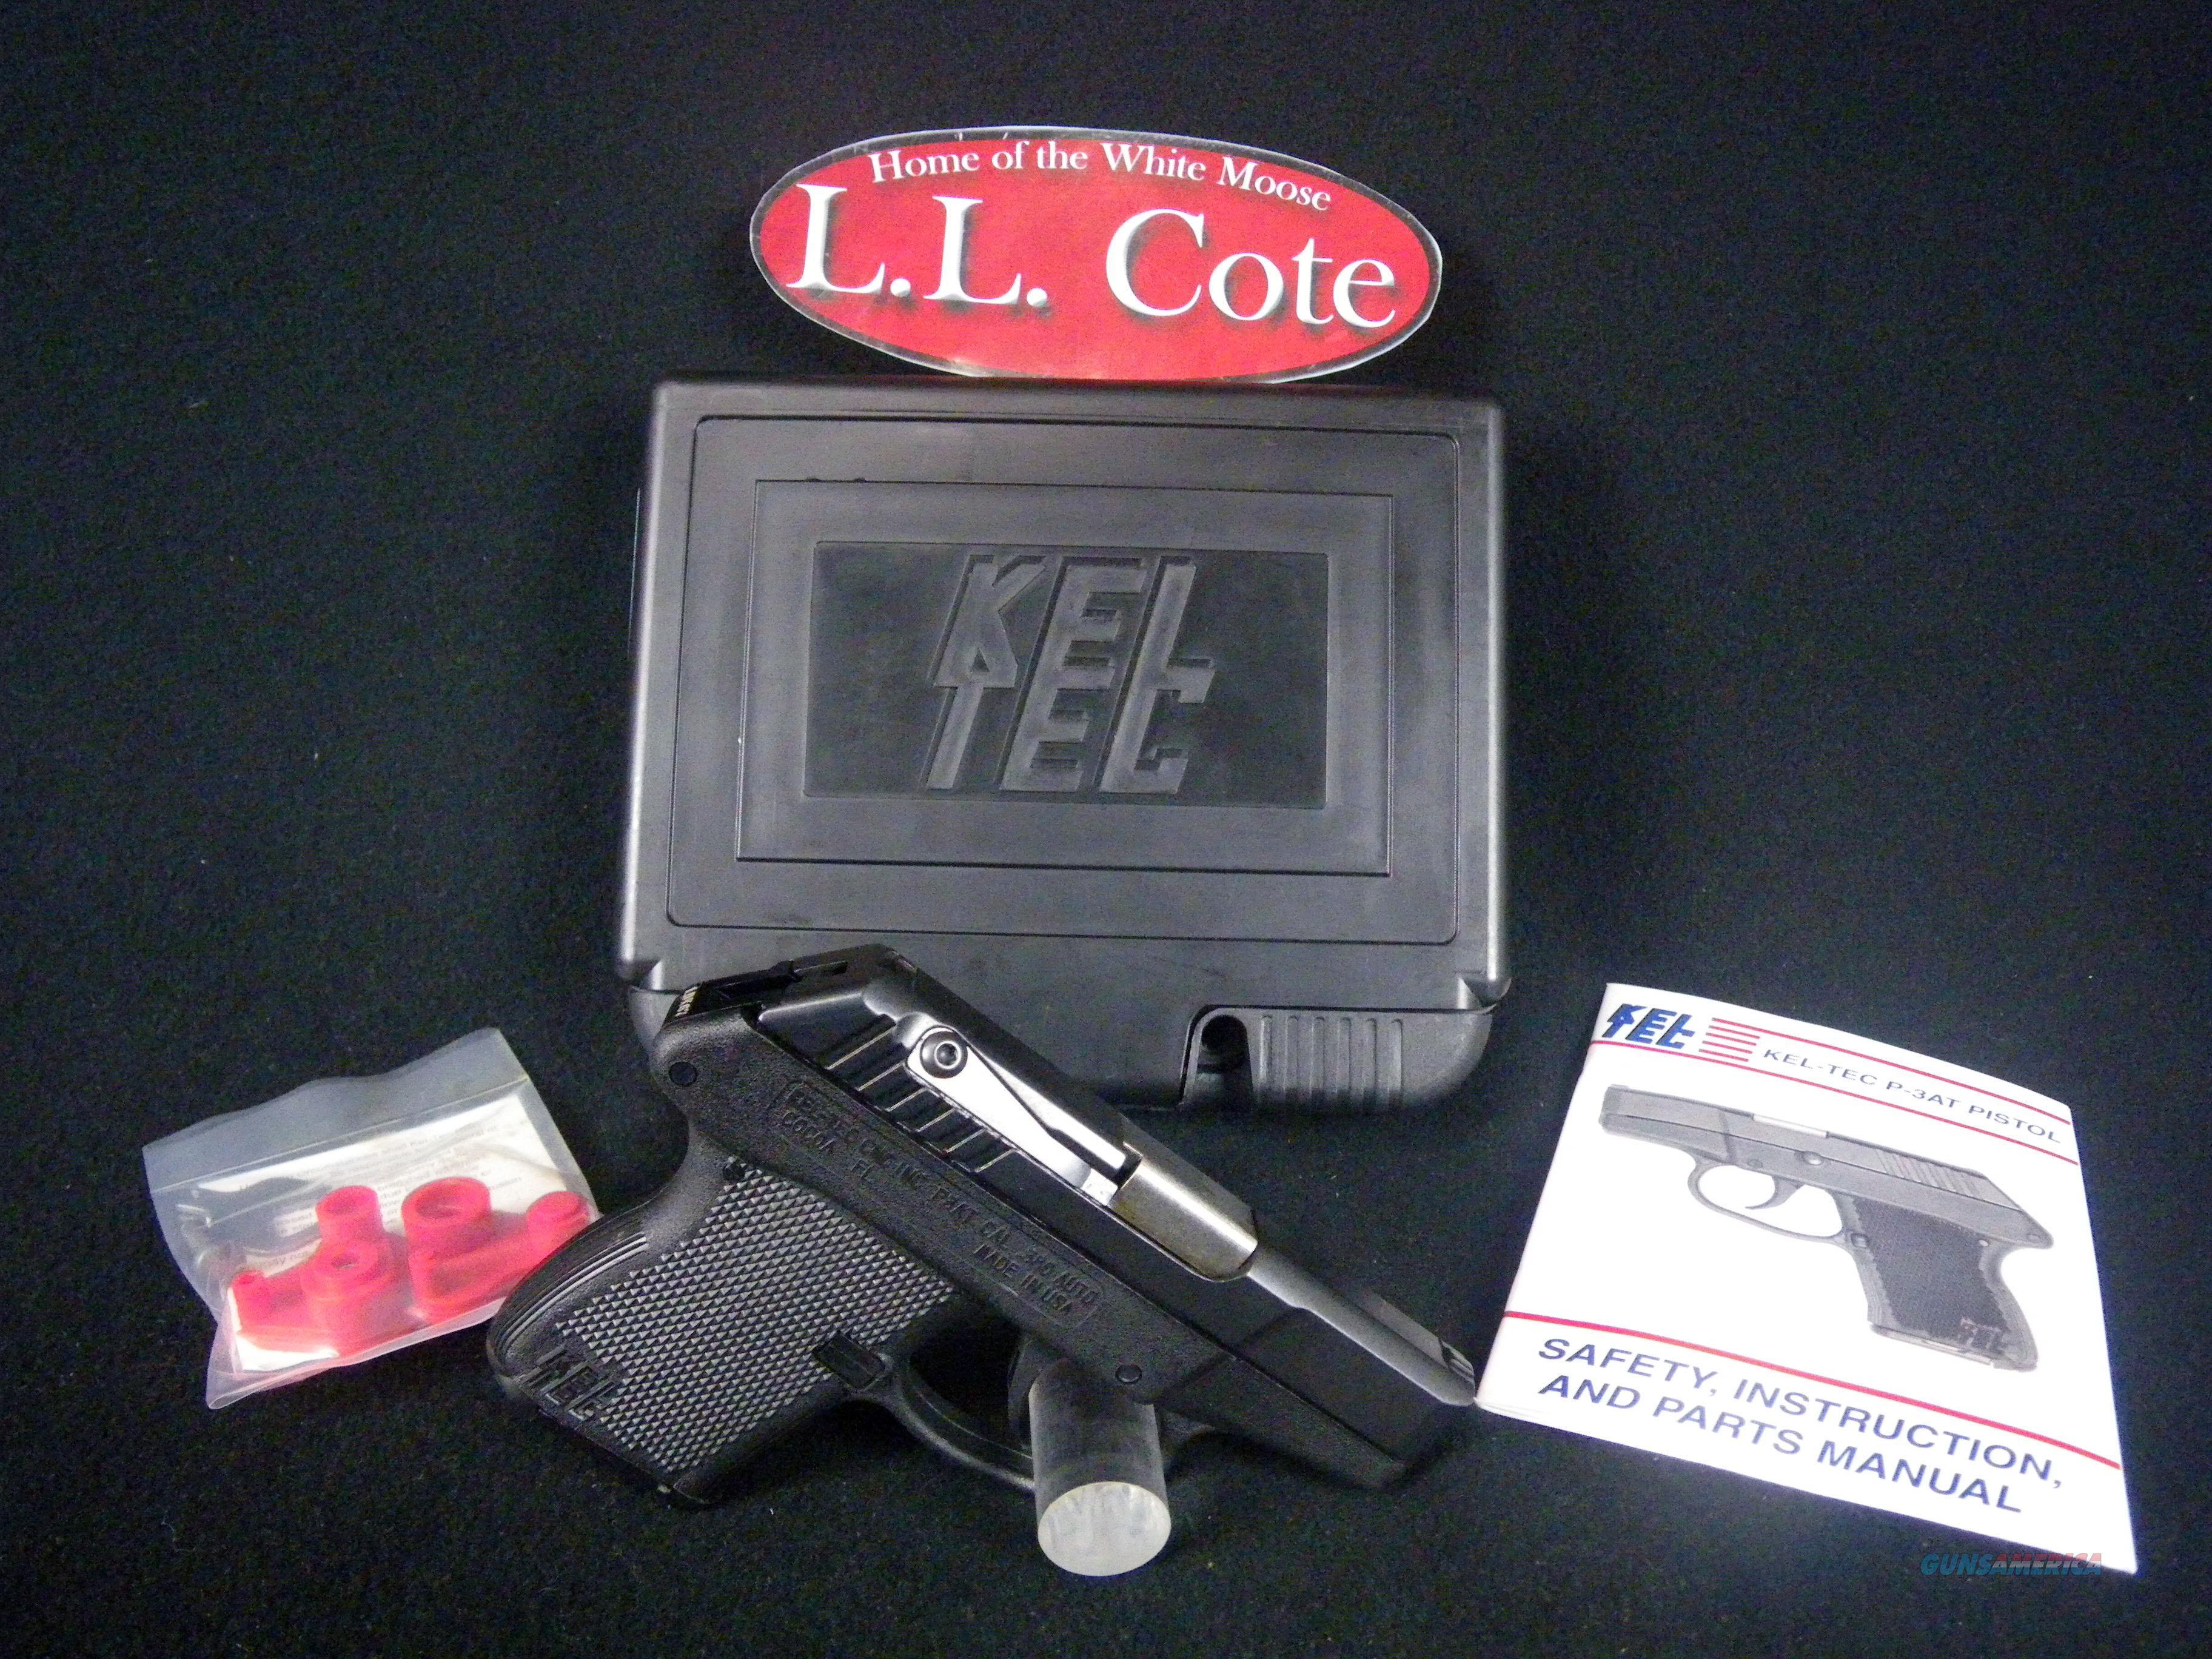 "Kel-Tec P-3AT 380acp 2.75"" NEW Matte Black 6 Round P-3AT  Guns > Pistols > Kel-Tec Pistols > Pocket Pistol Type"